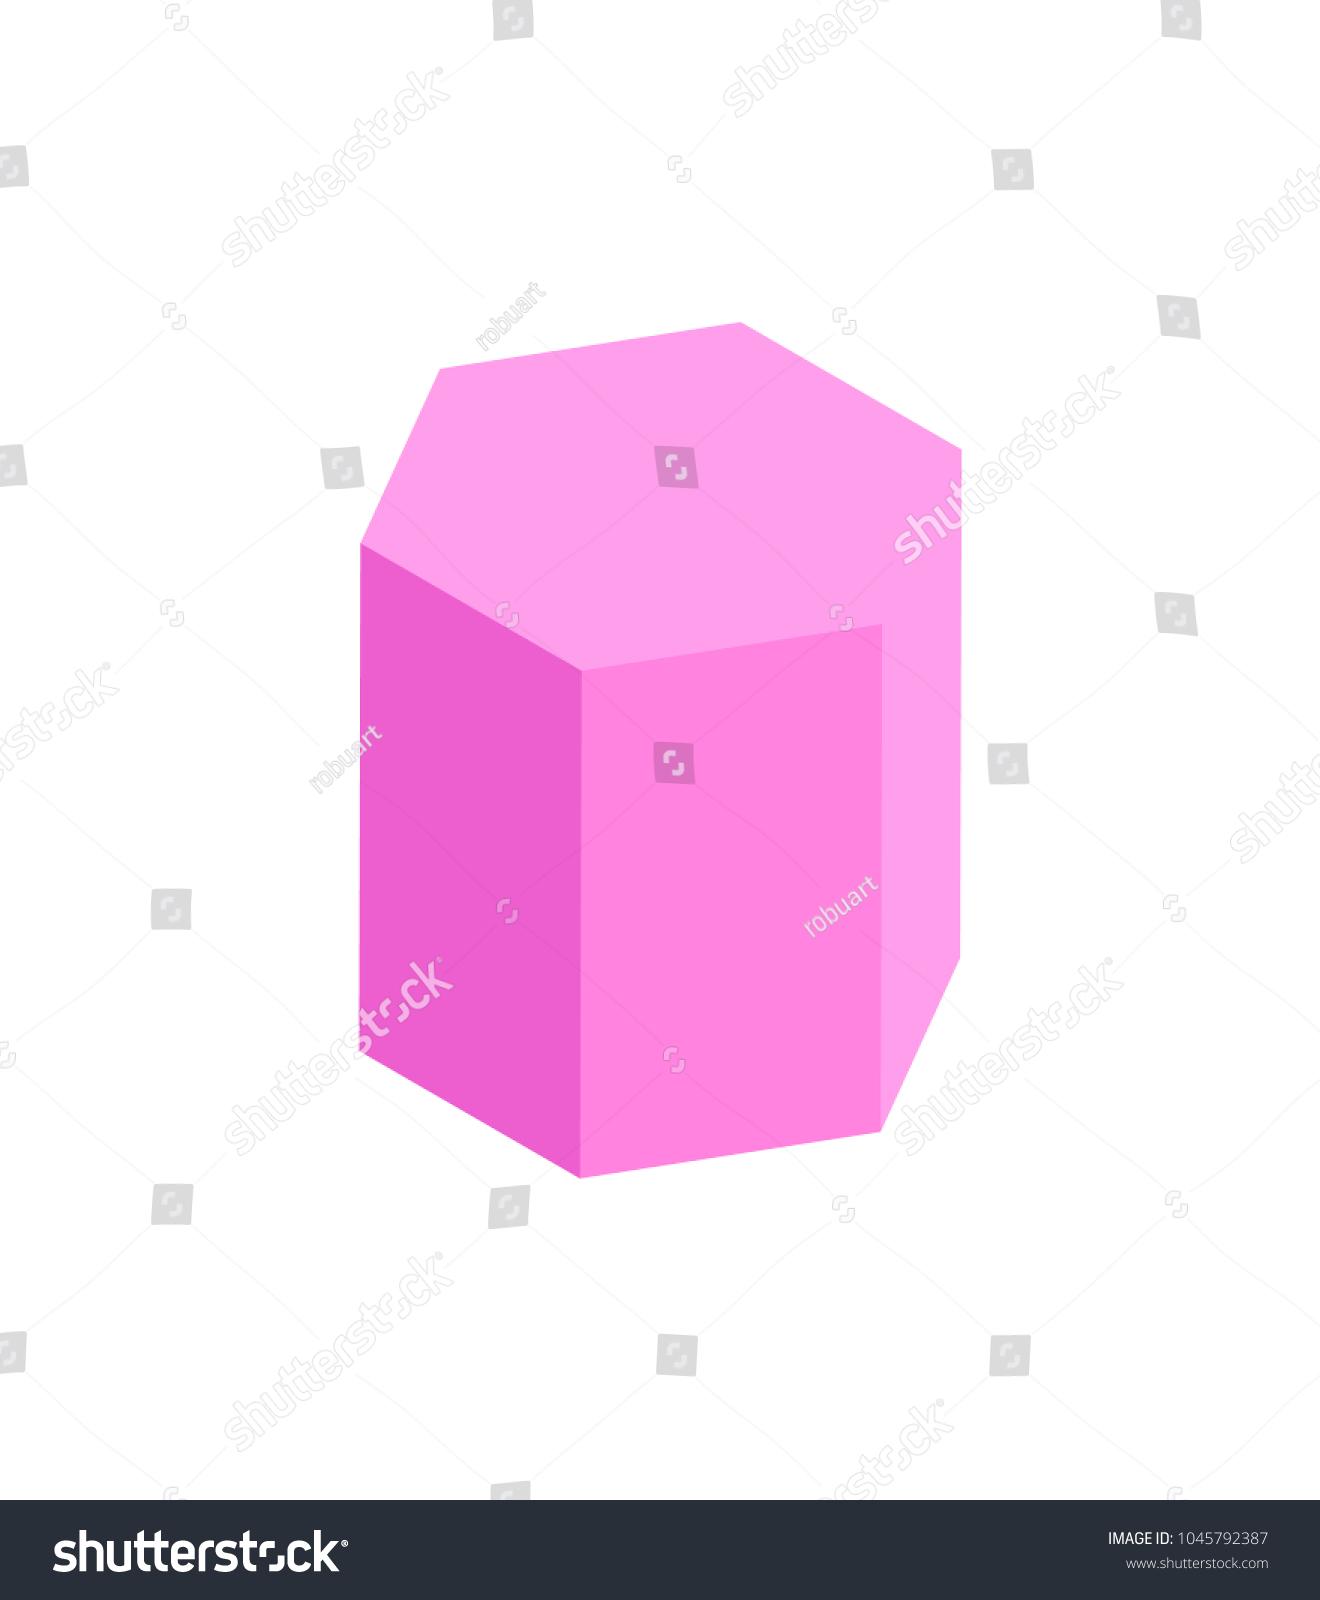 Hexagonal Prism Geometric Figure Color Template Stock Vector